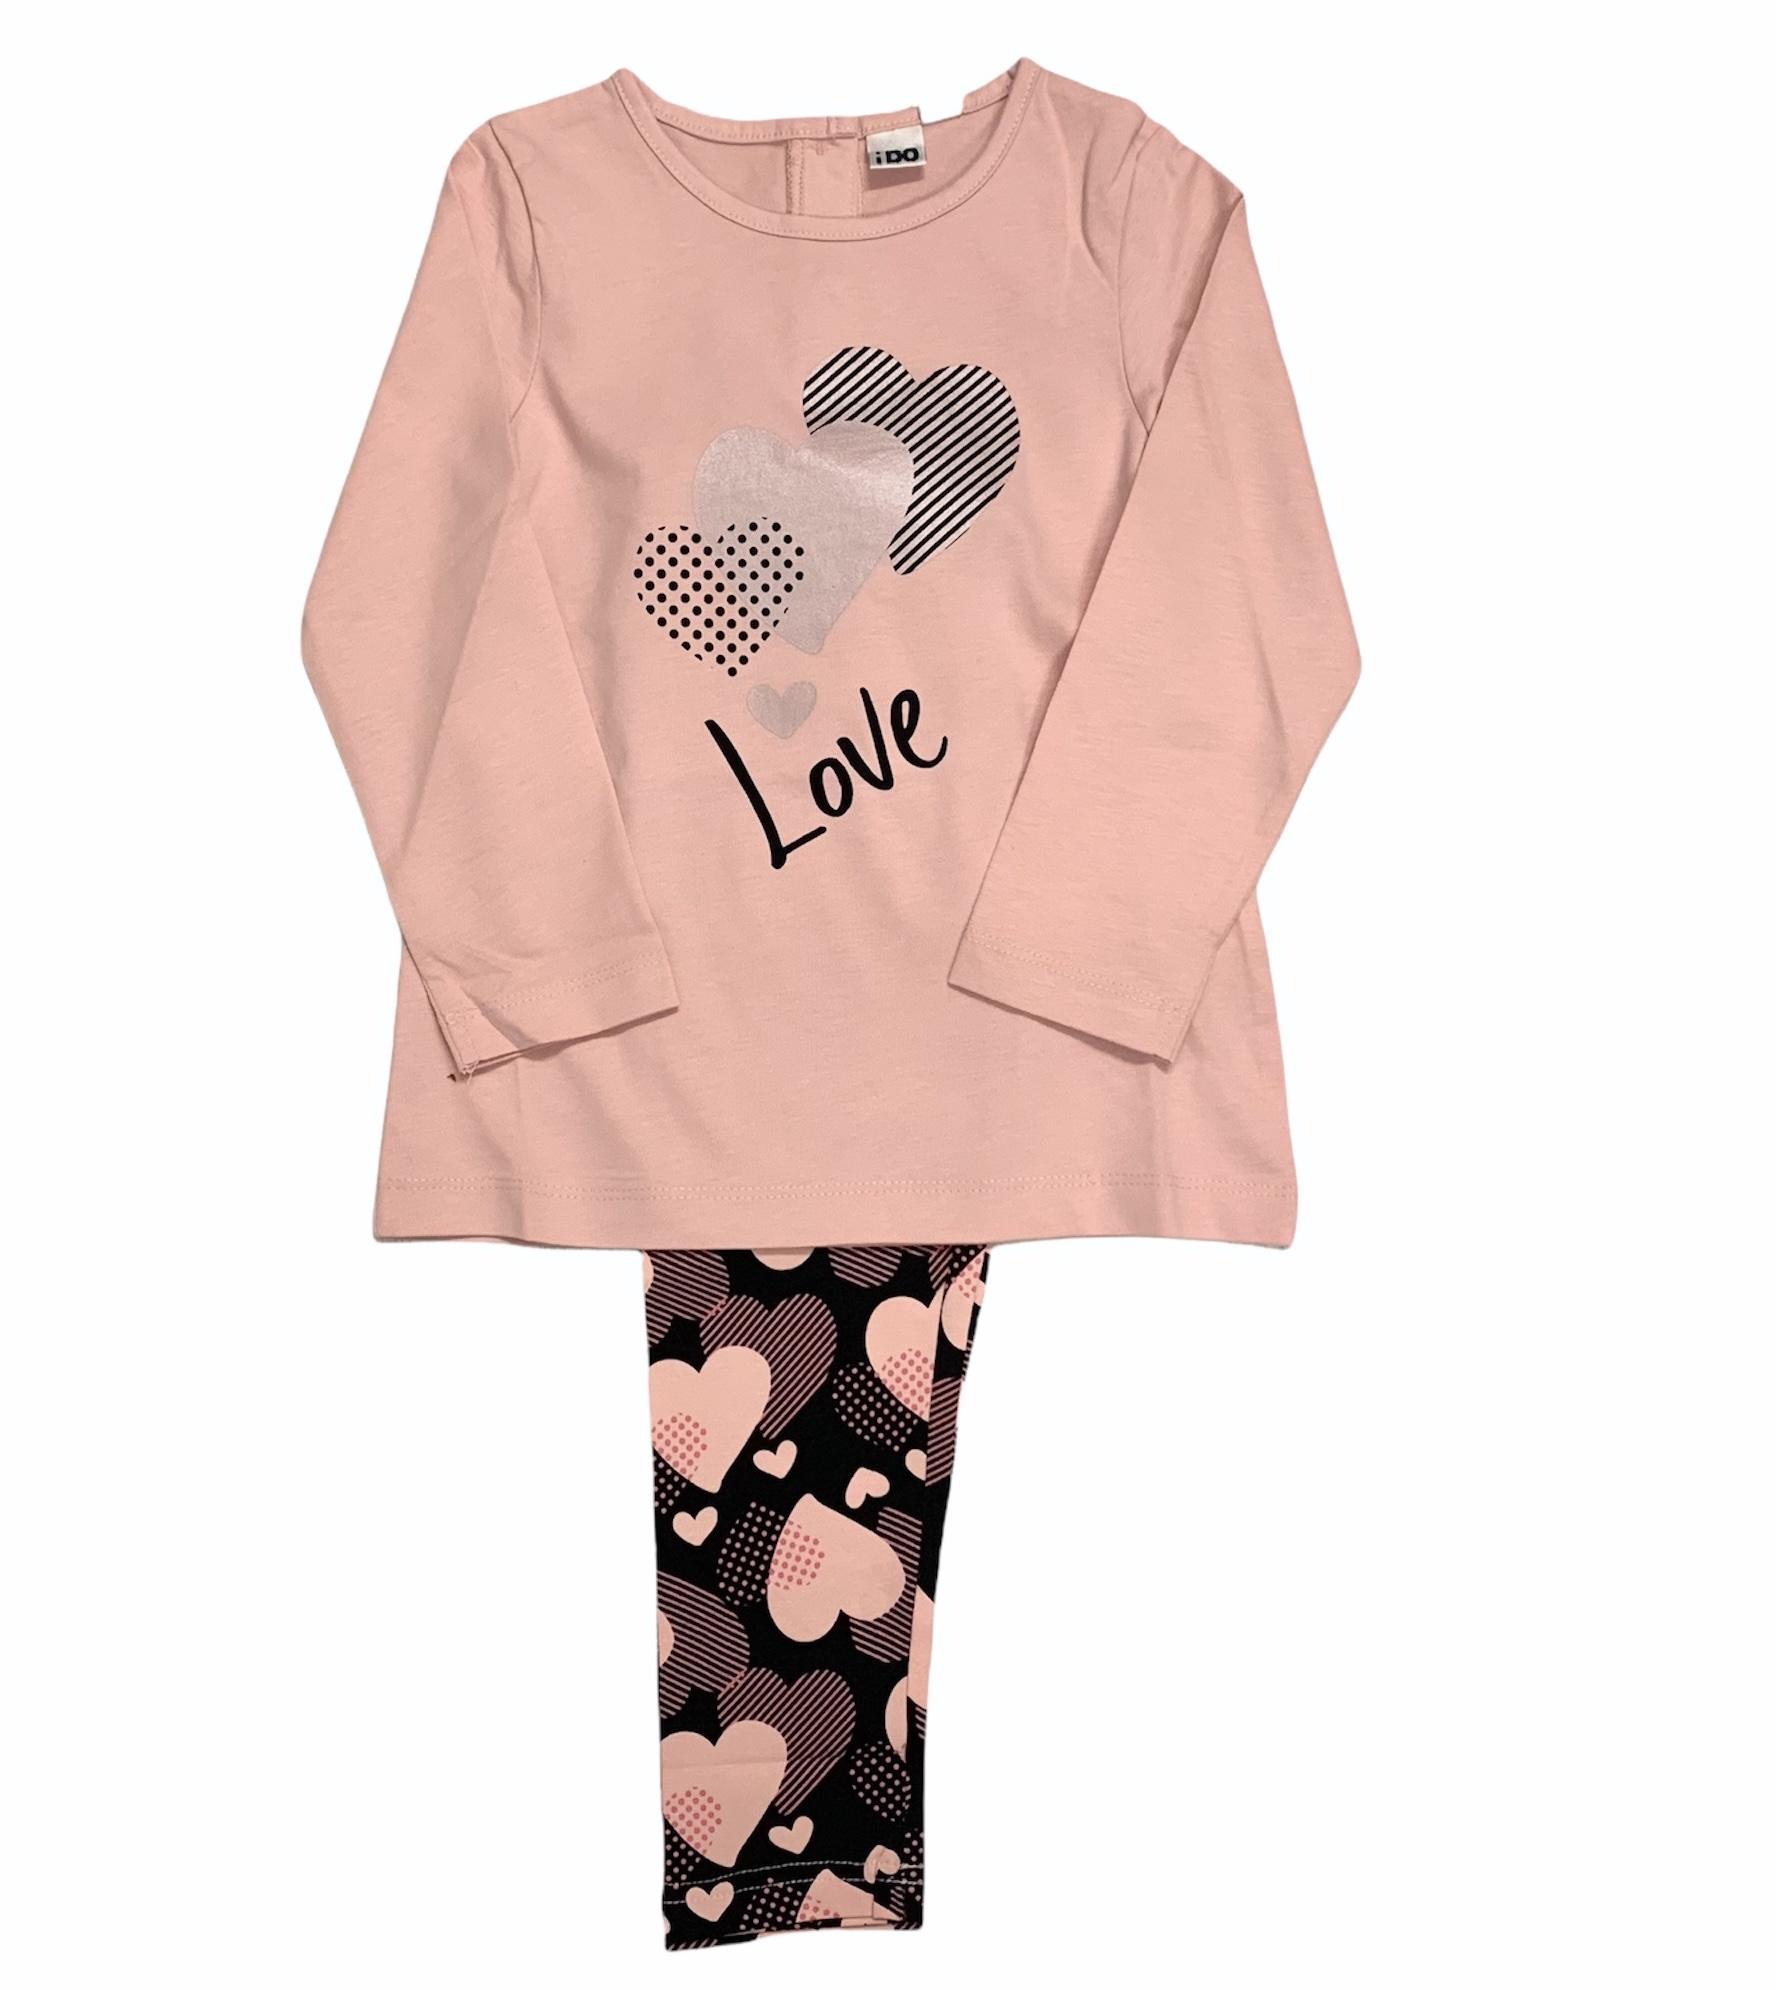 Ido iDO Love Heart Legging Set AW21